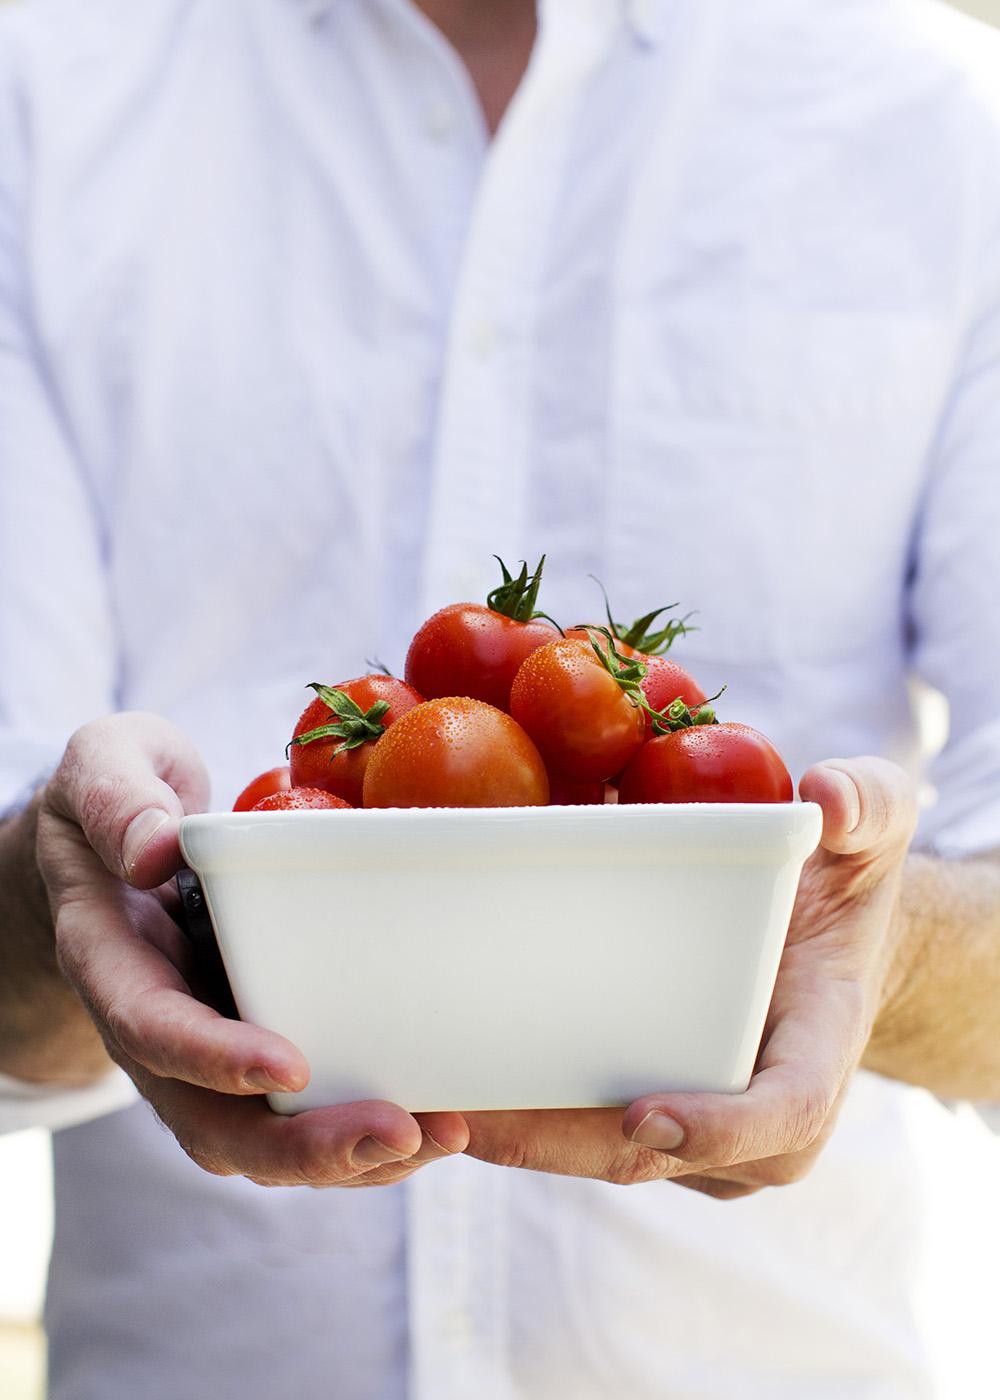 Garlic and Herb-Roasted Cherry Tomato Carbonara